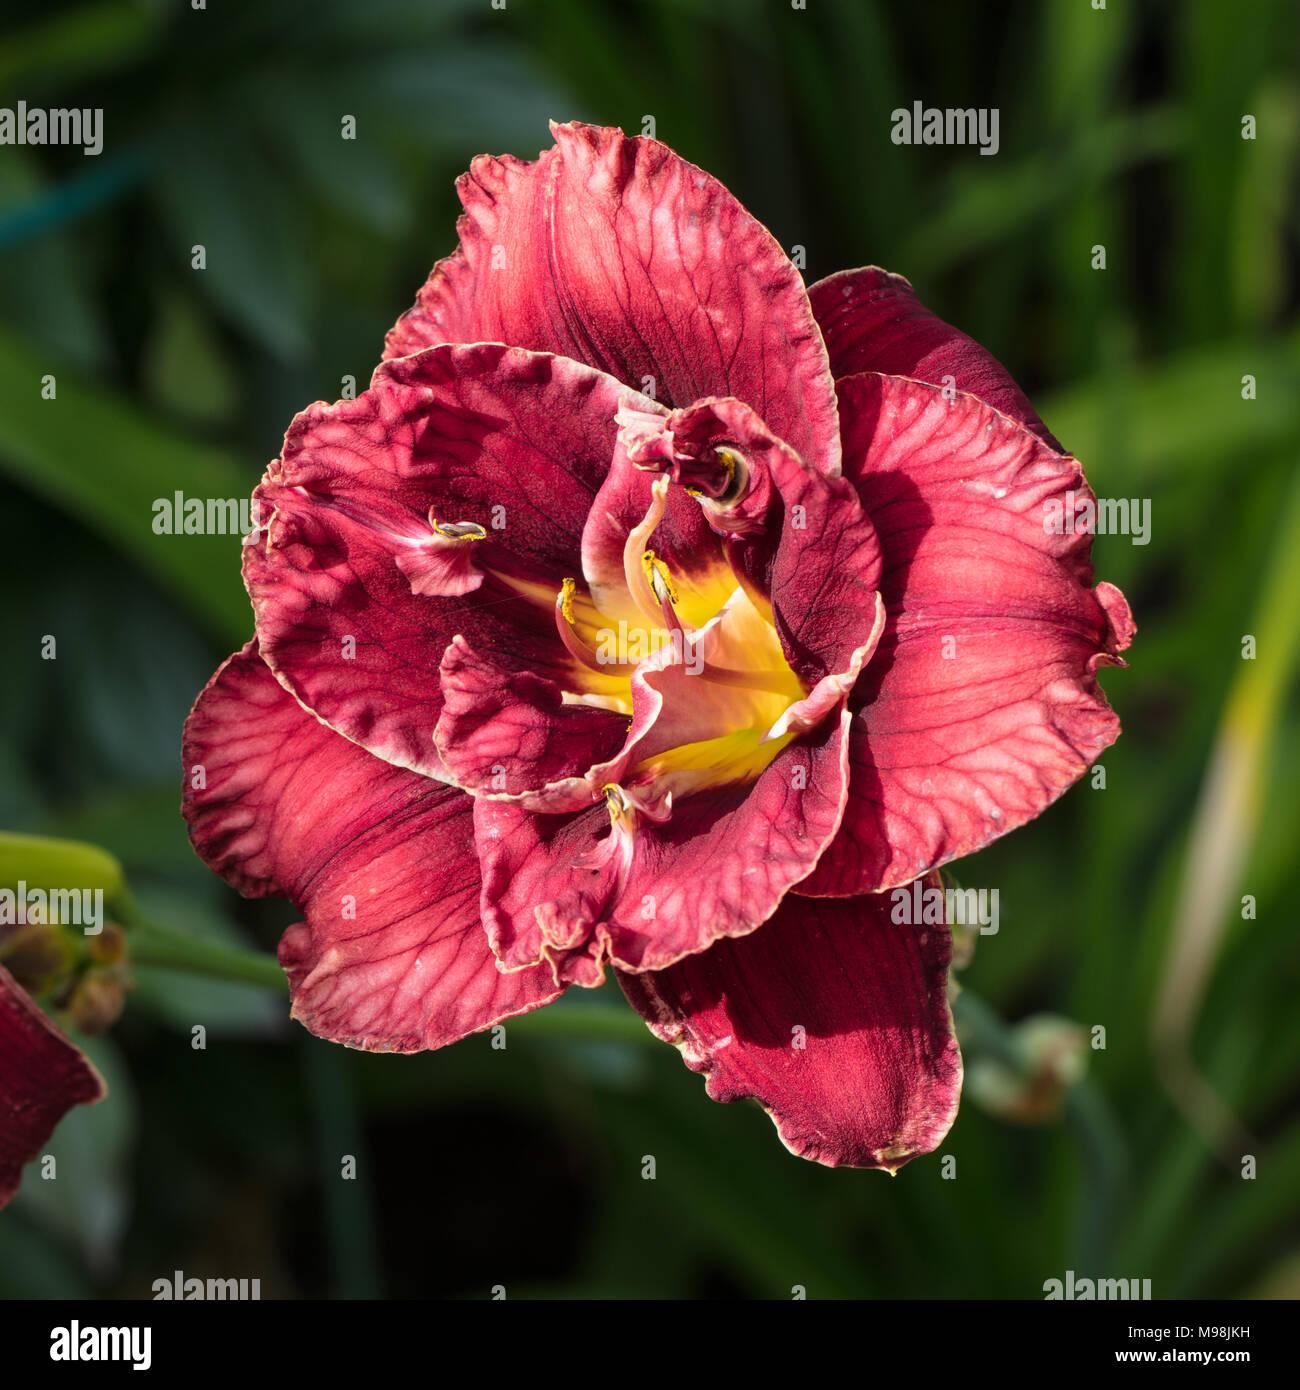 'Stellar Double Rose' Daylily, Daglilja (Hemerocallis) - Stock Image